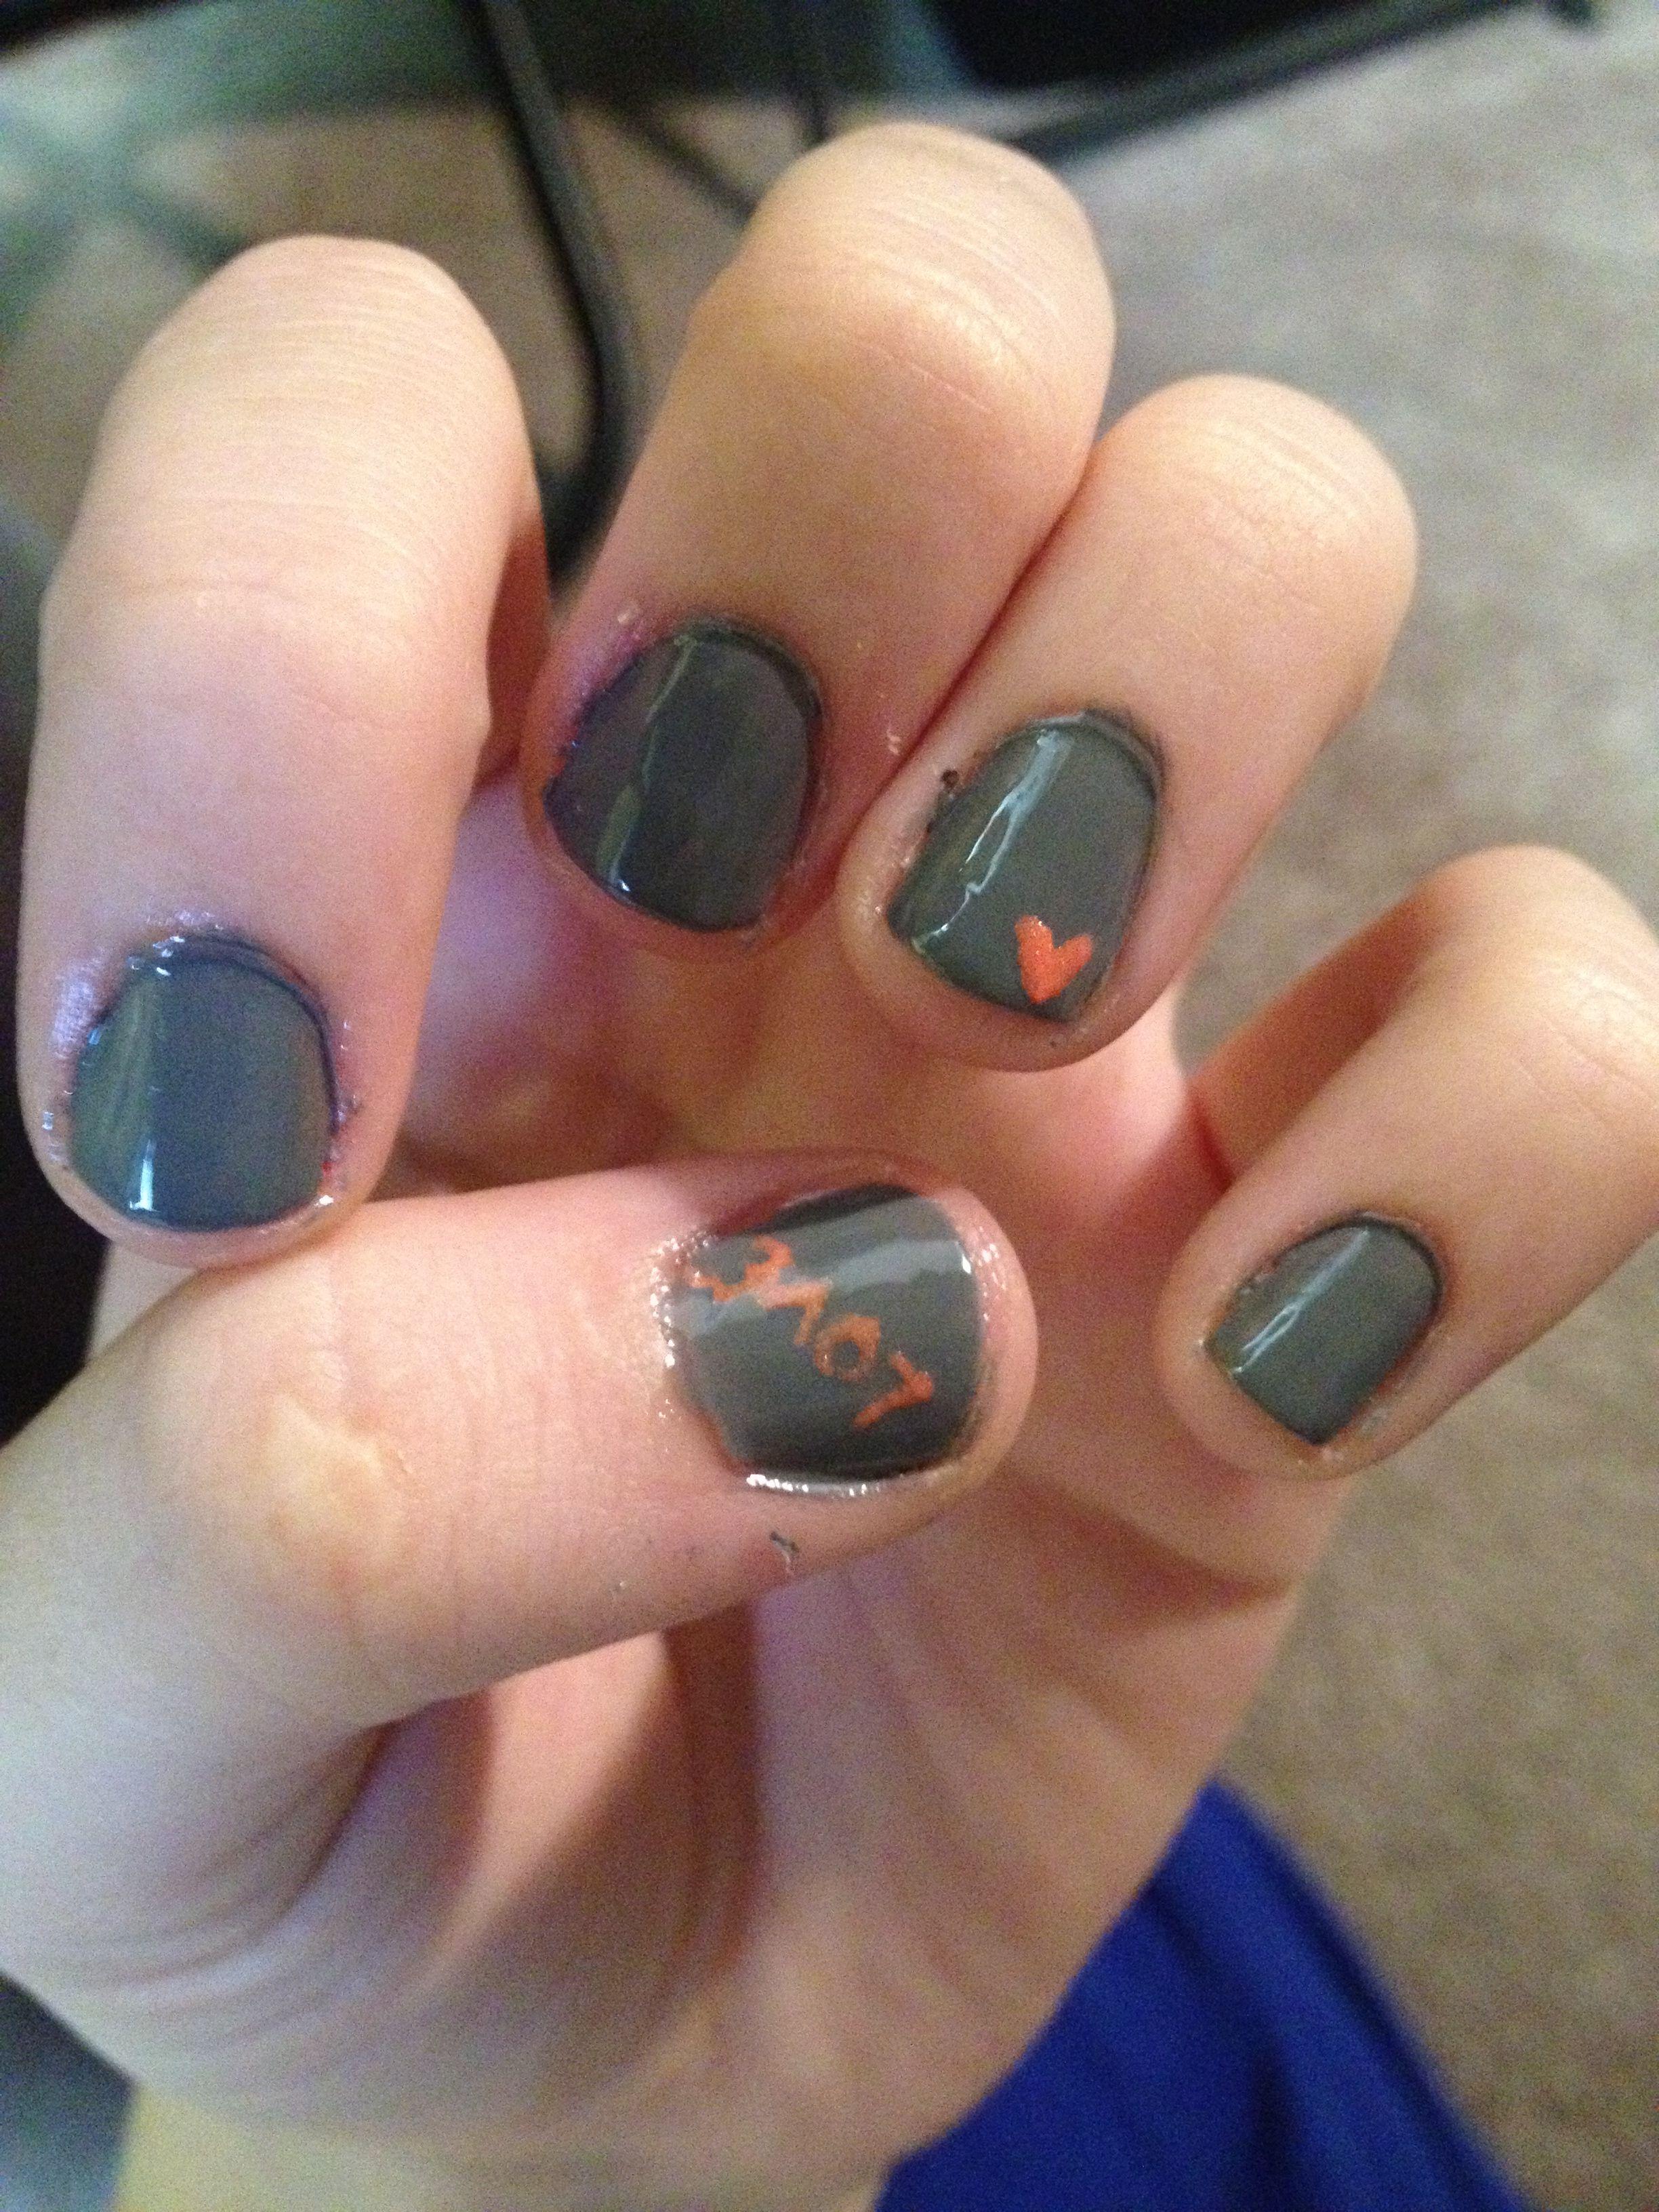 Finger nails! Grey and orange!